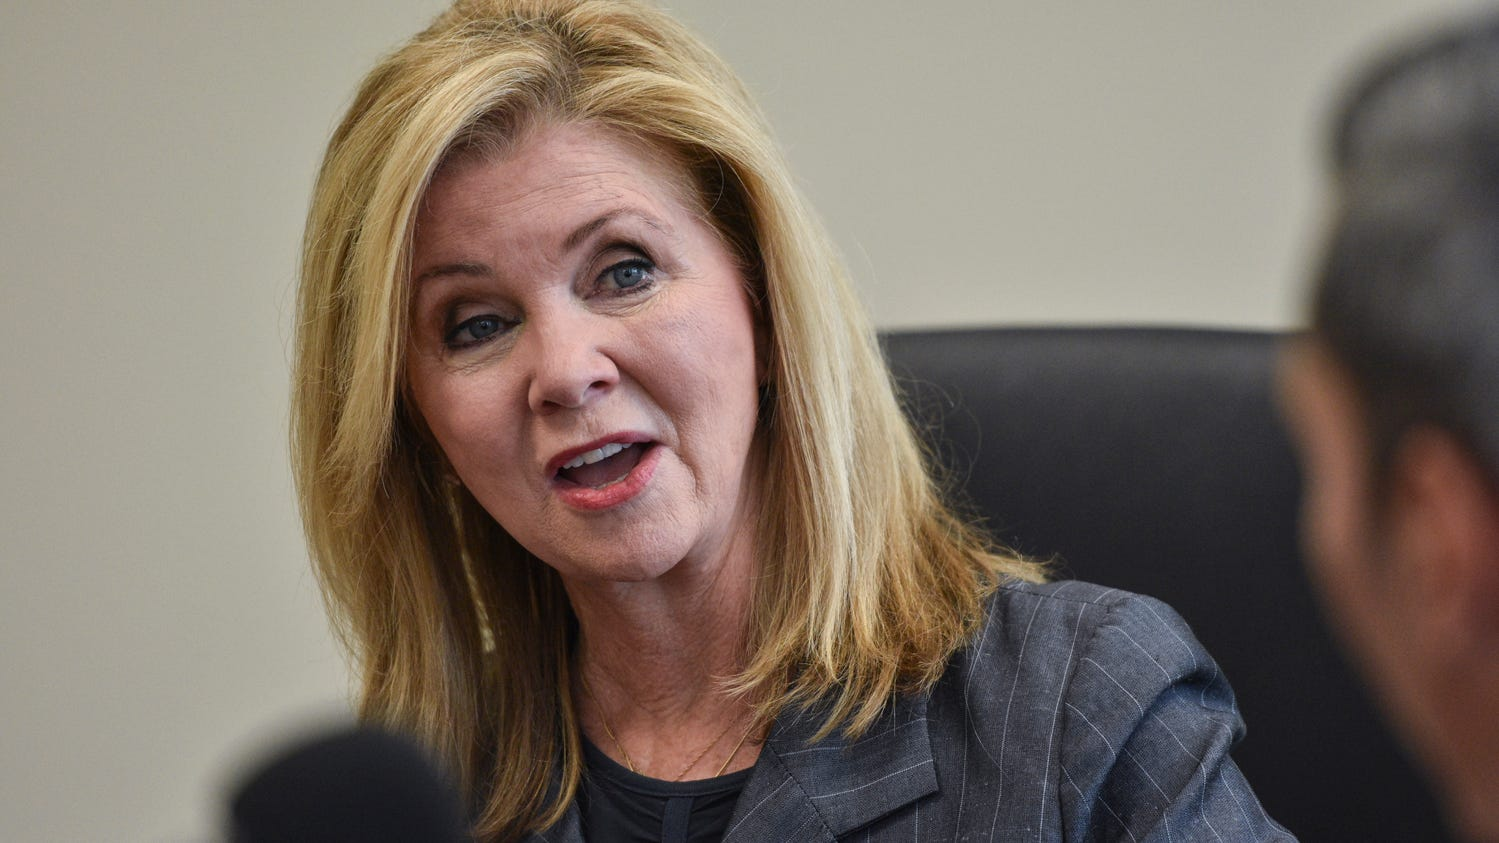 U.S. Senate candidate Rep. Marsha Blackburn talks with The Tennessean Editorial Board on Monday, Sept. 17, 2018.